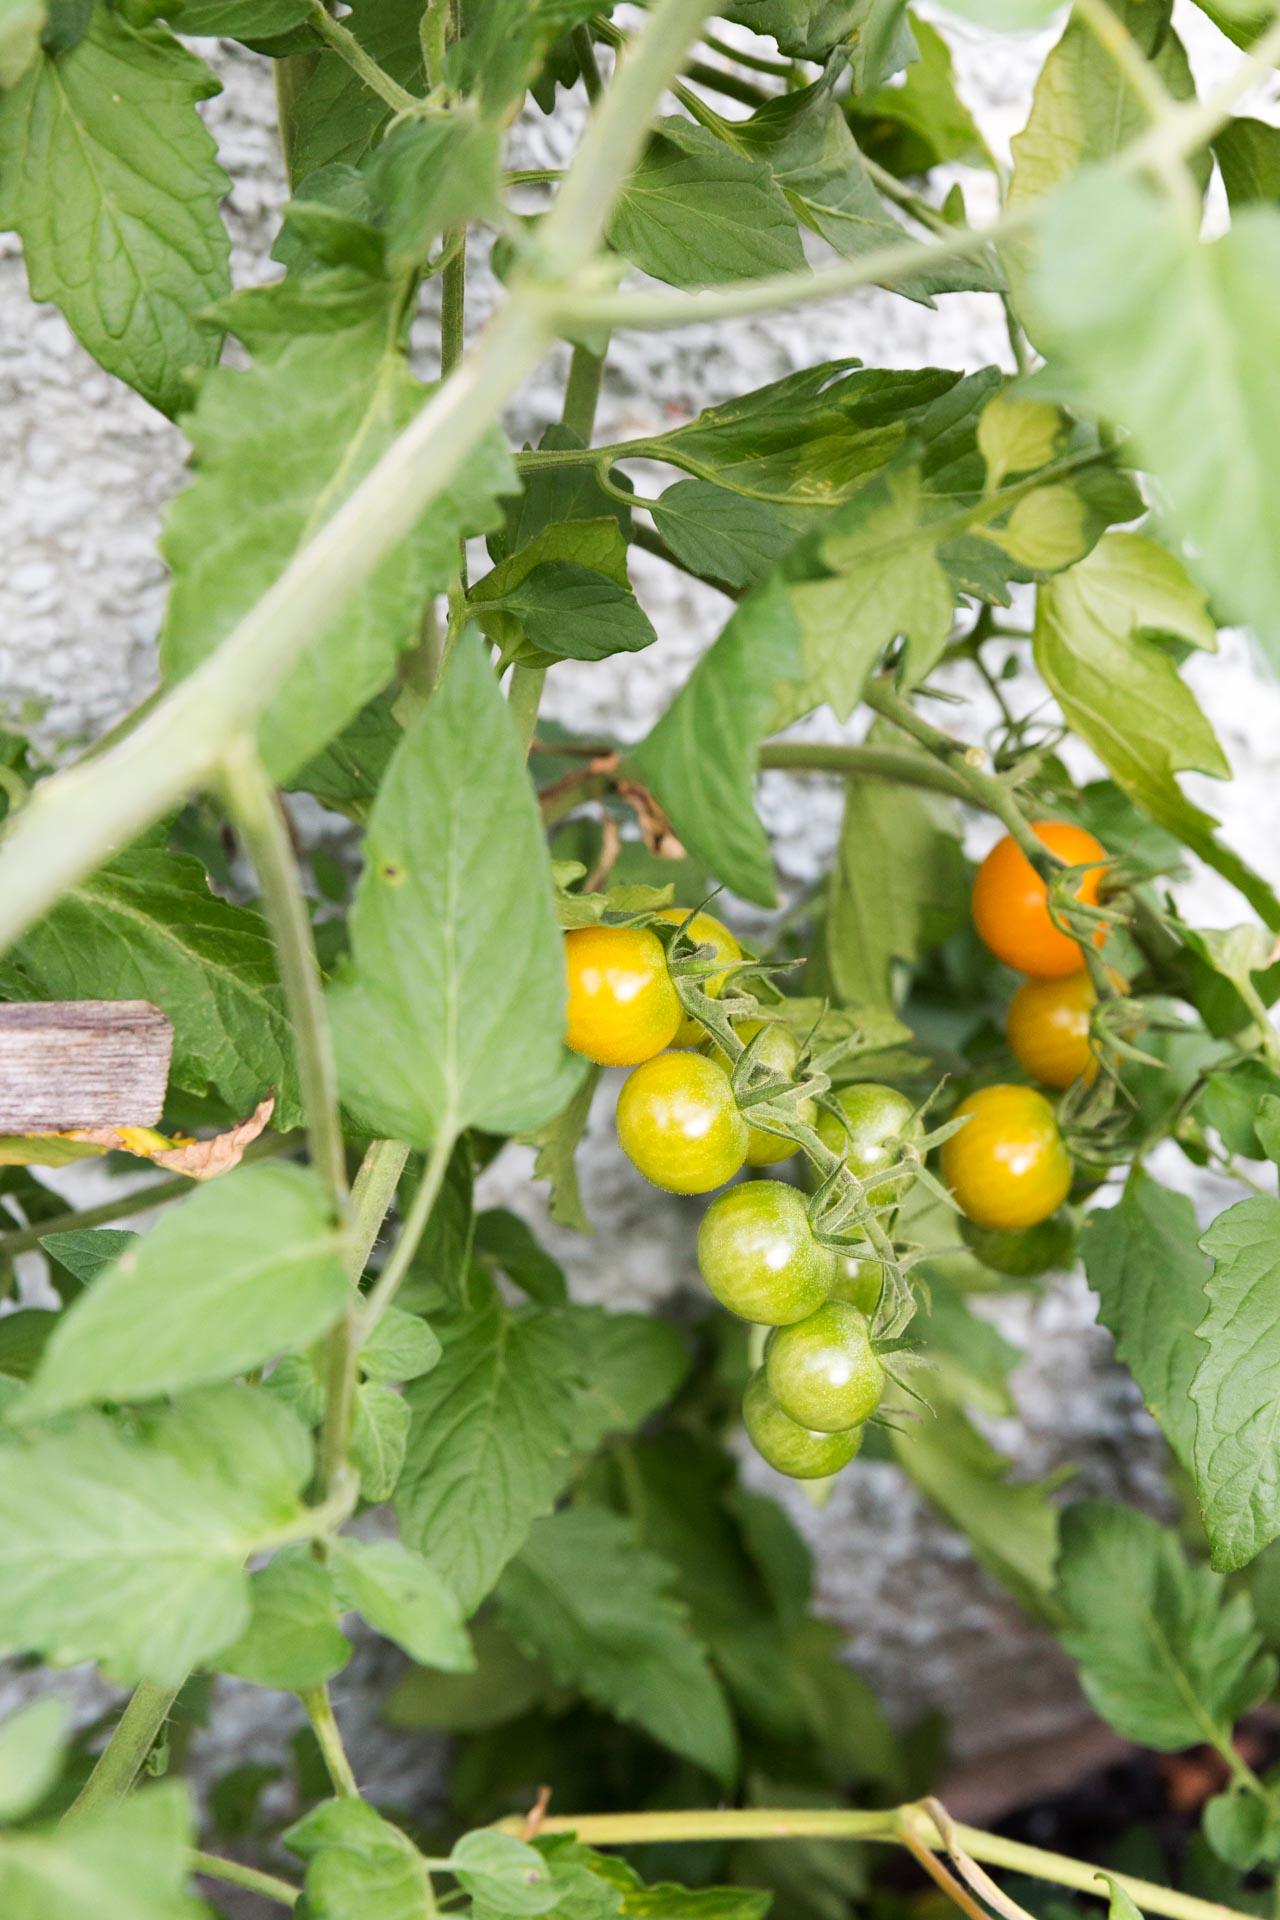 tomatoes in The Ferg garden